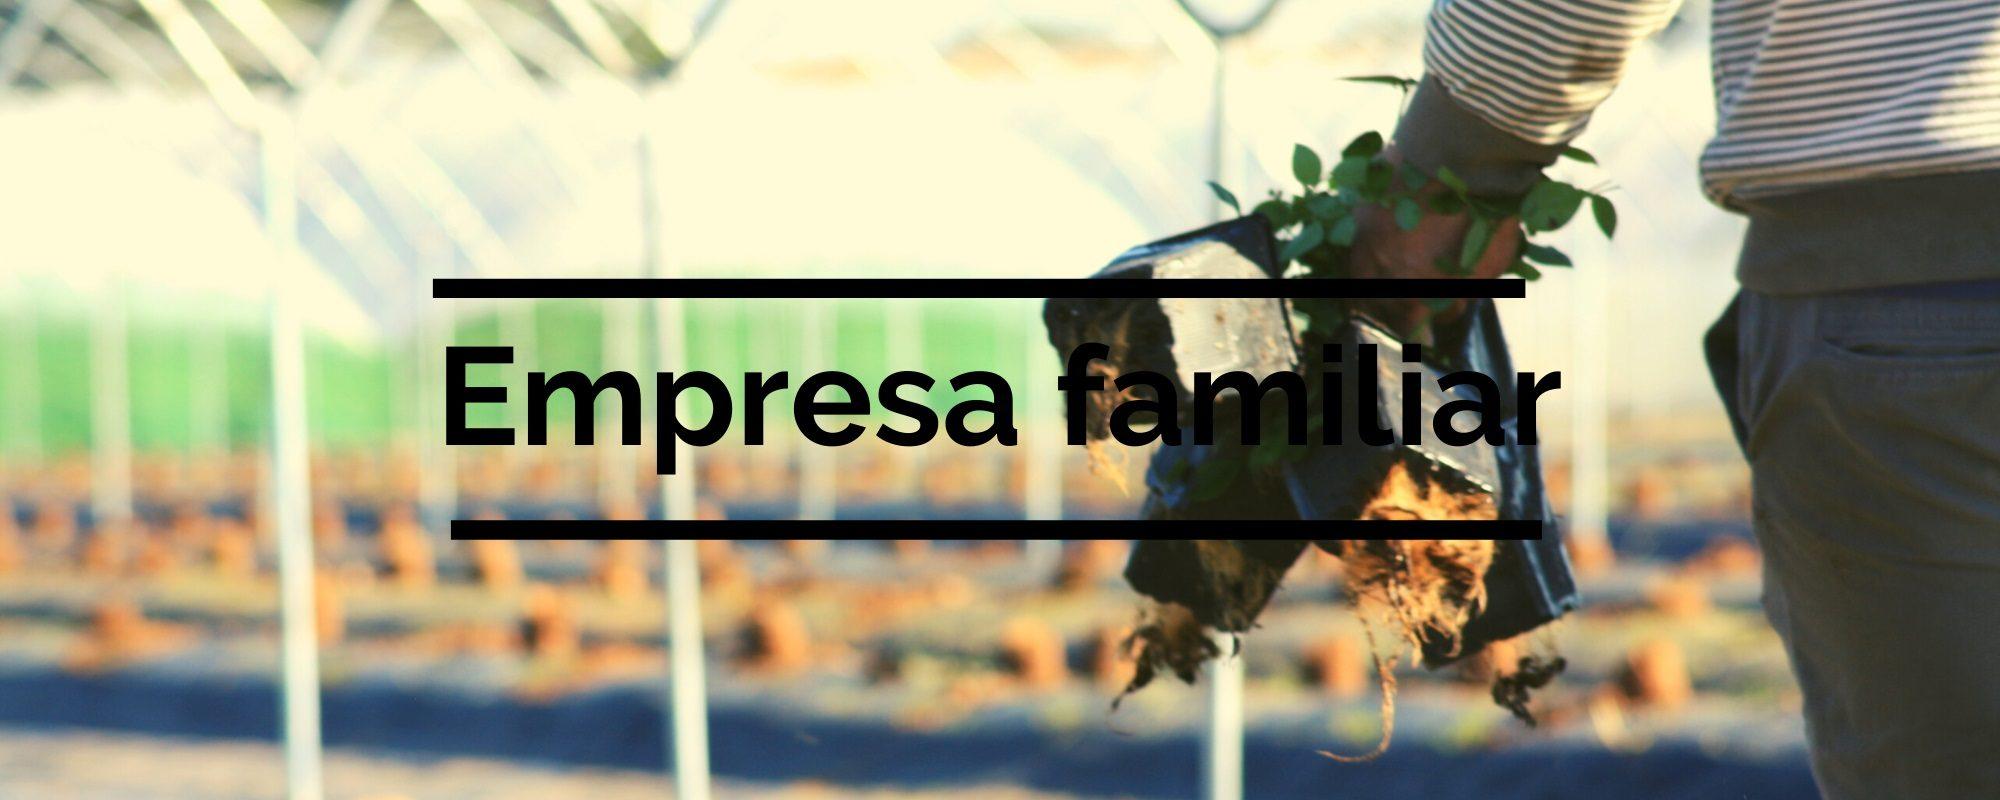 agroecologica-el-origen-empresa-familiar-01